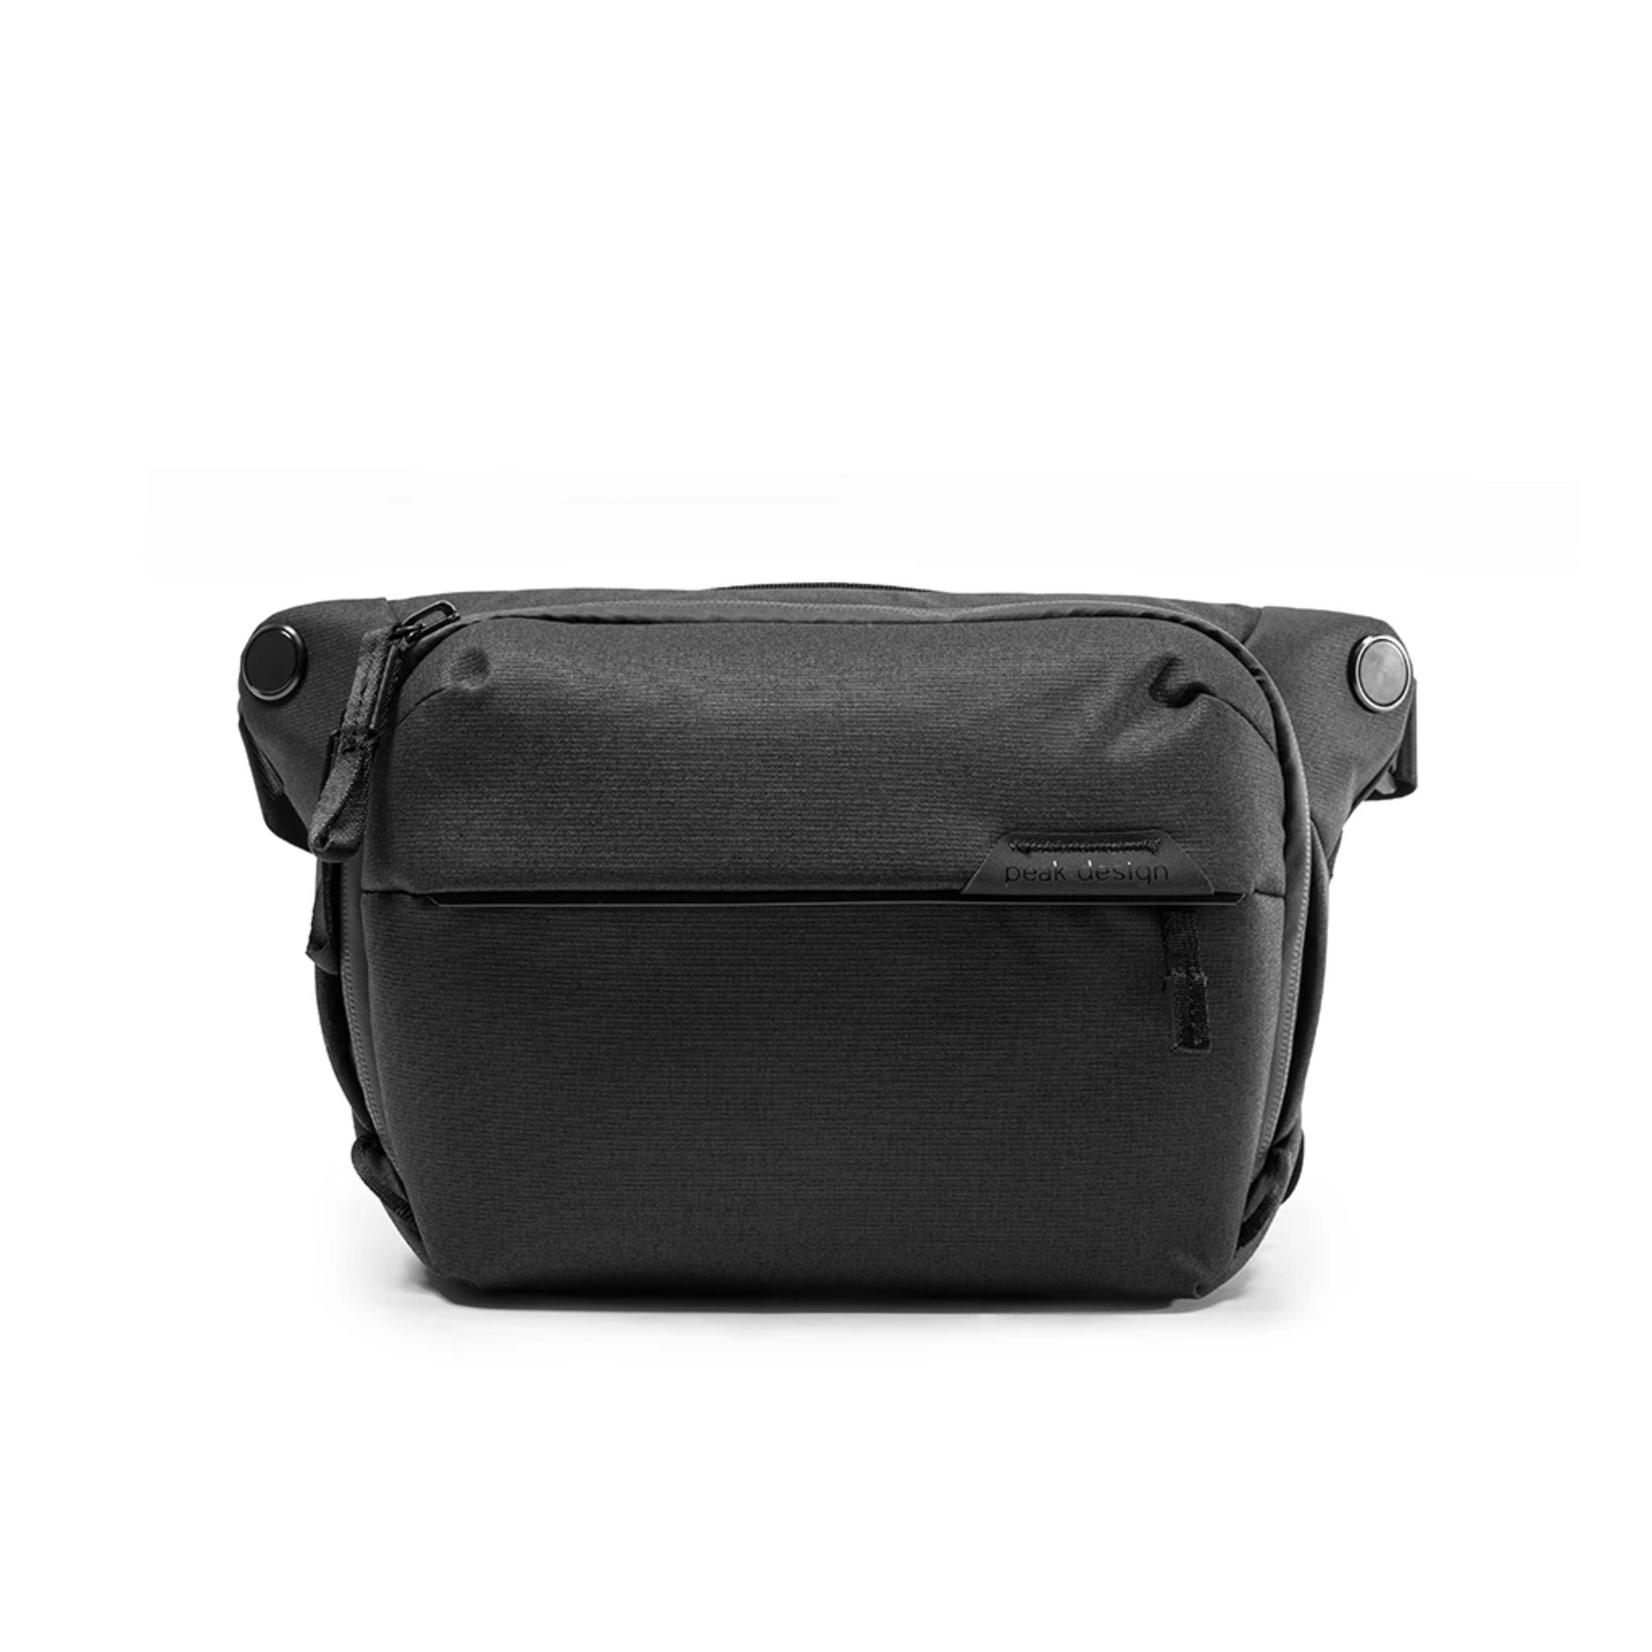 Peak Design Everyday Sling 3L - Black